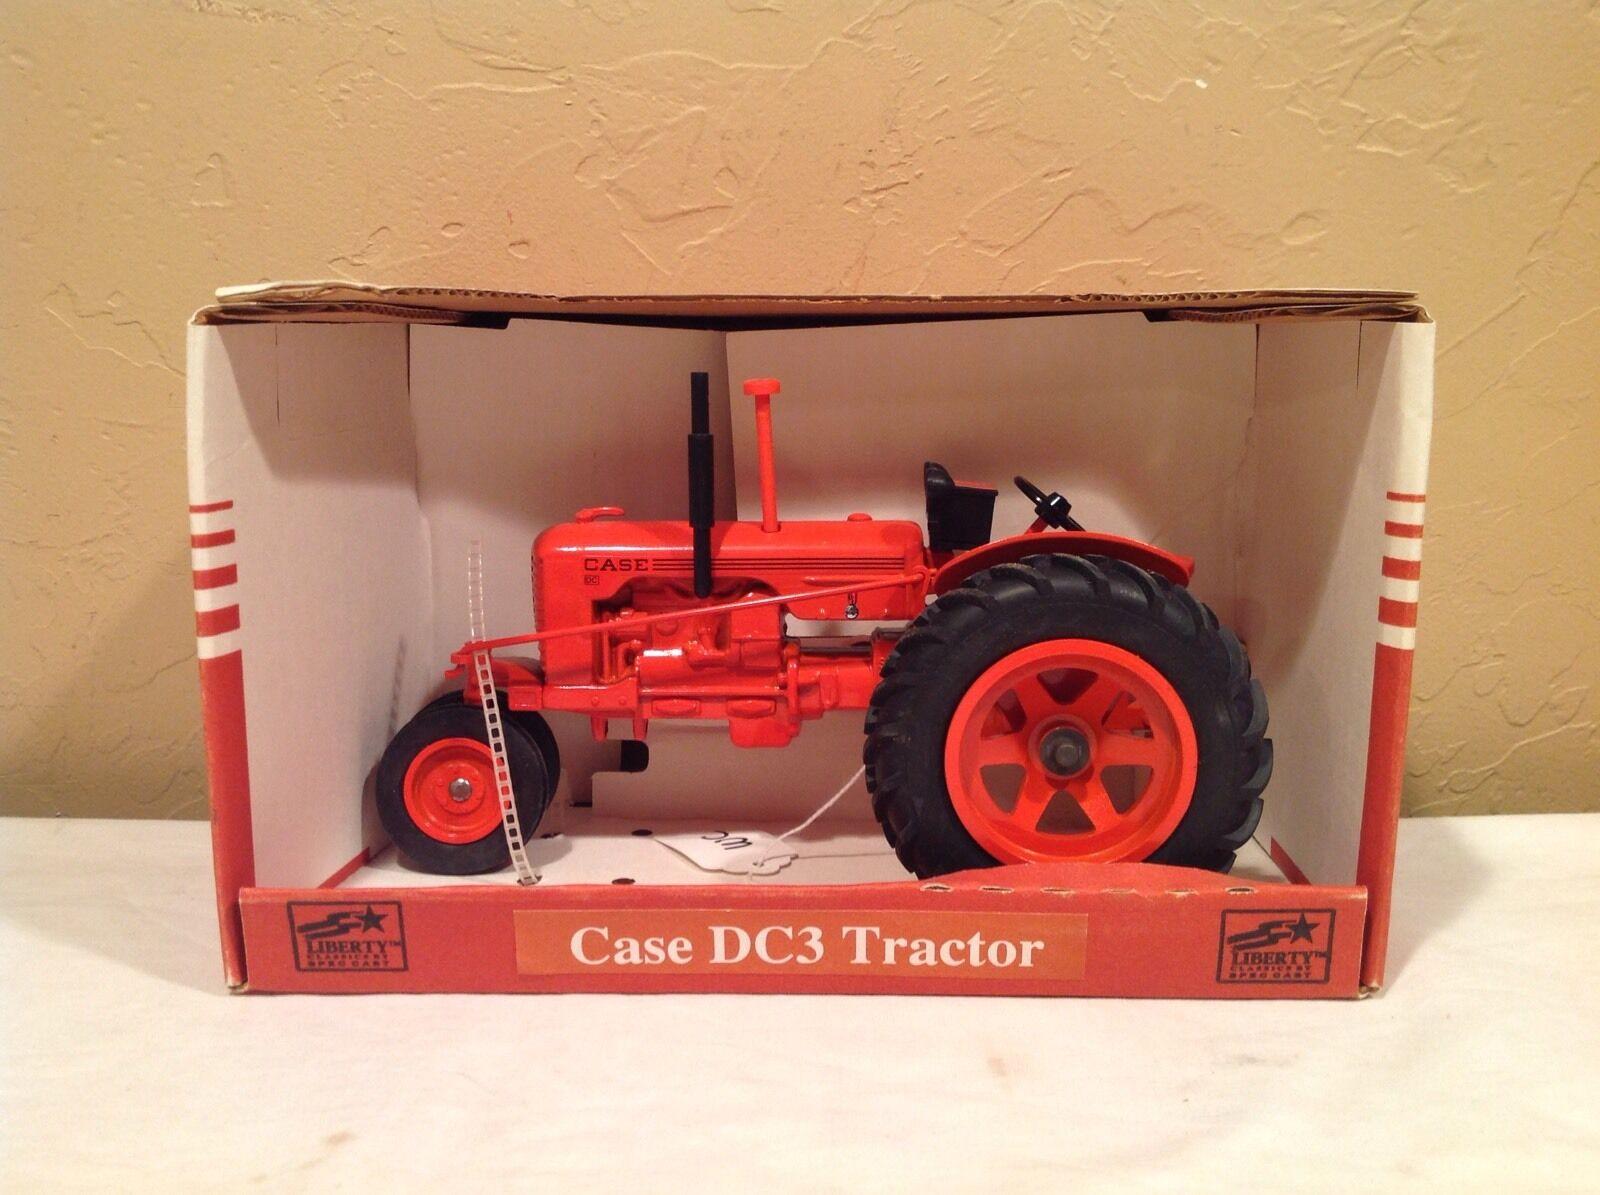 SpecCast 1 16 Die Cast Case IH Case DC3 Tractor